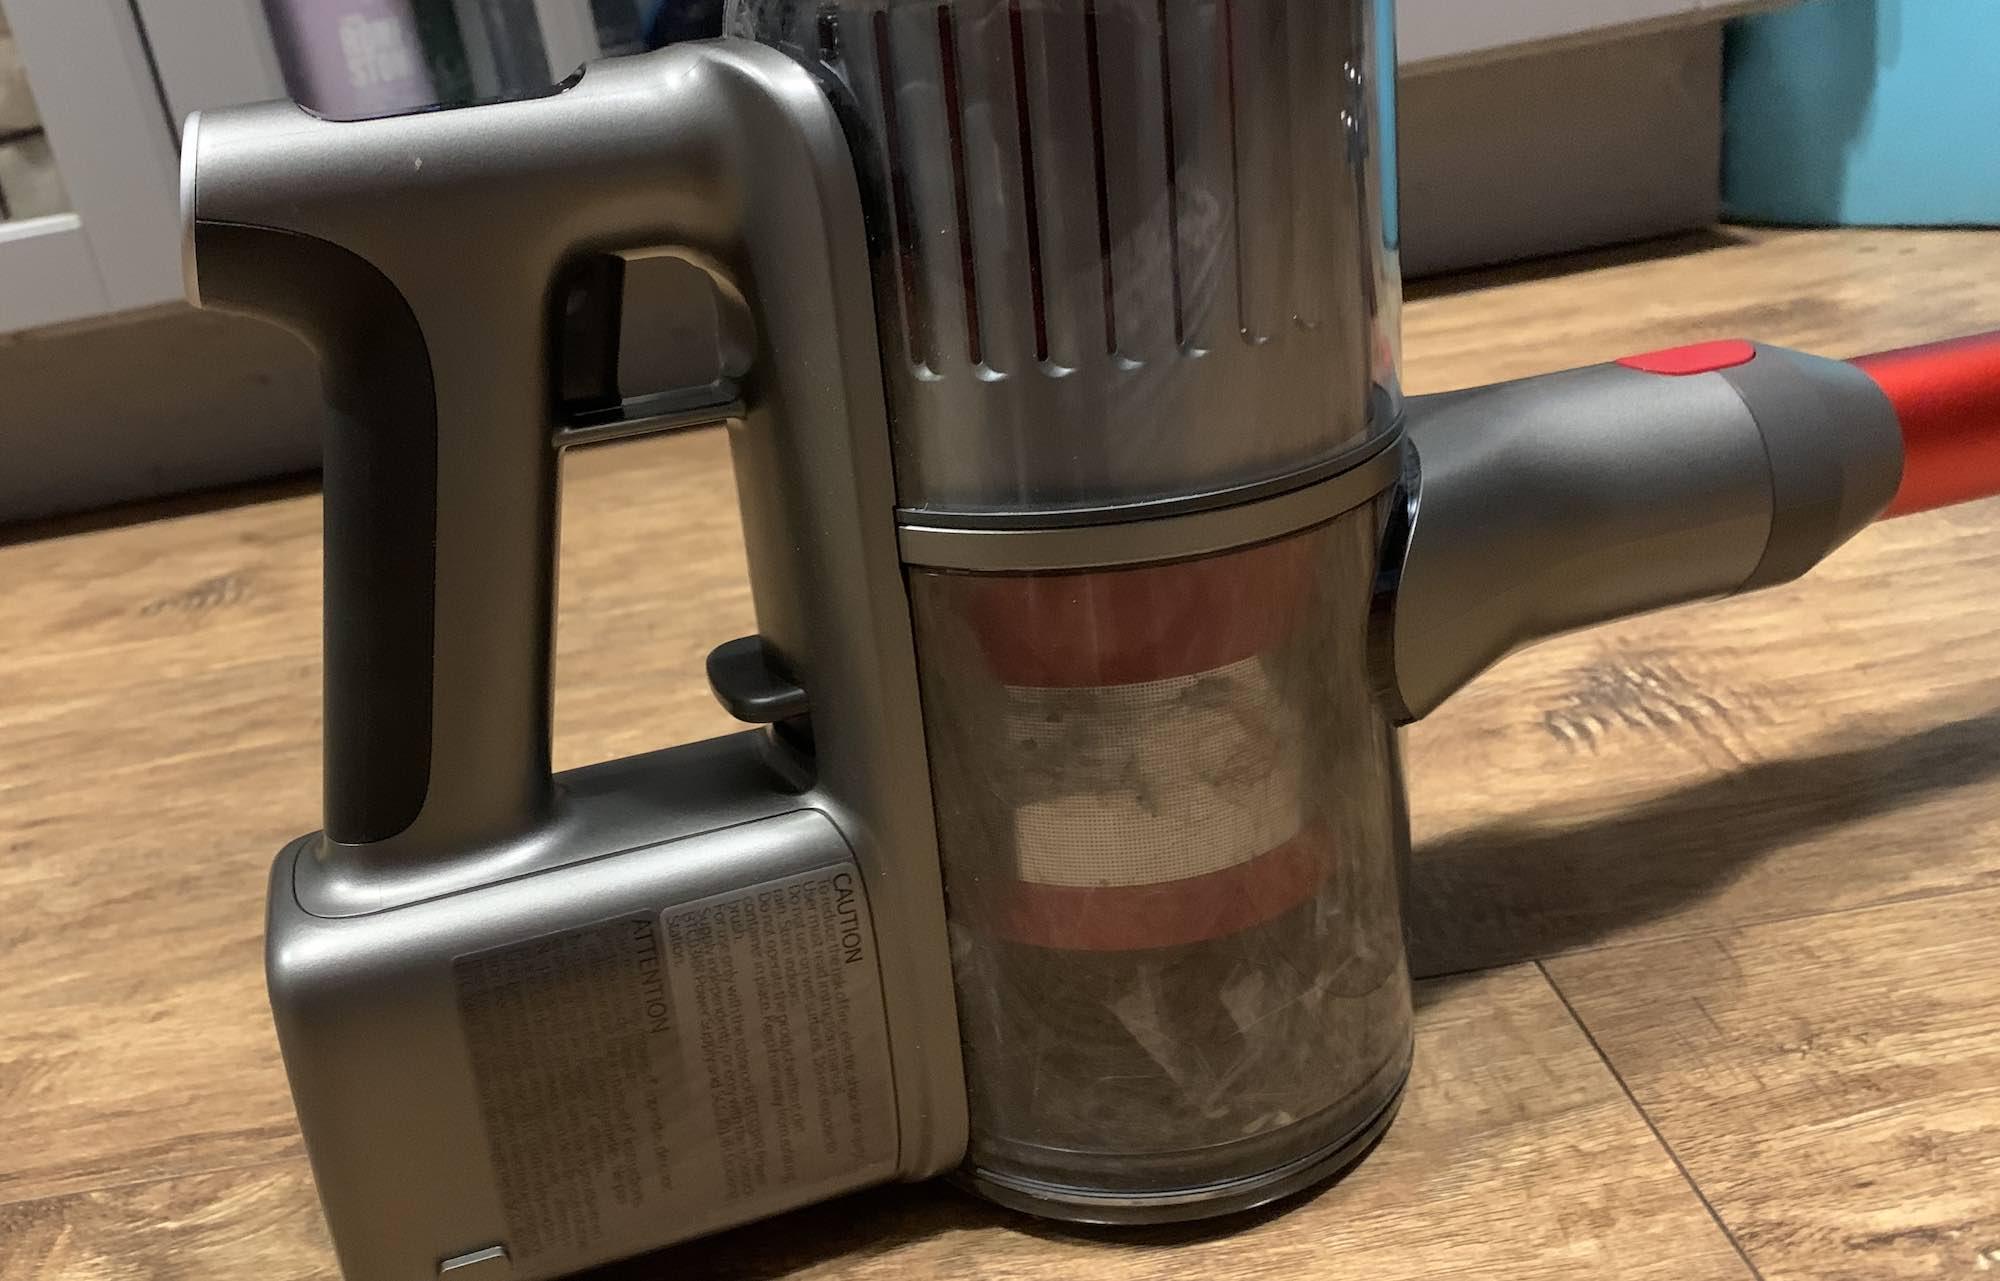 Dust bin Roborock H6 Adapt